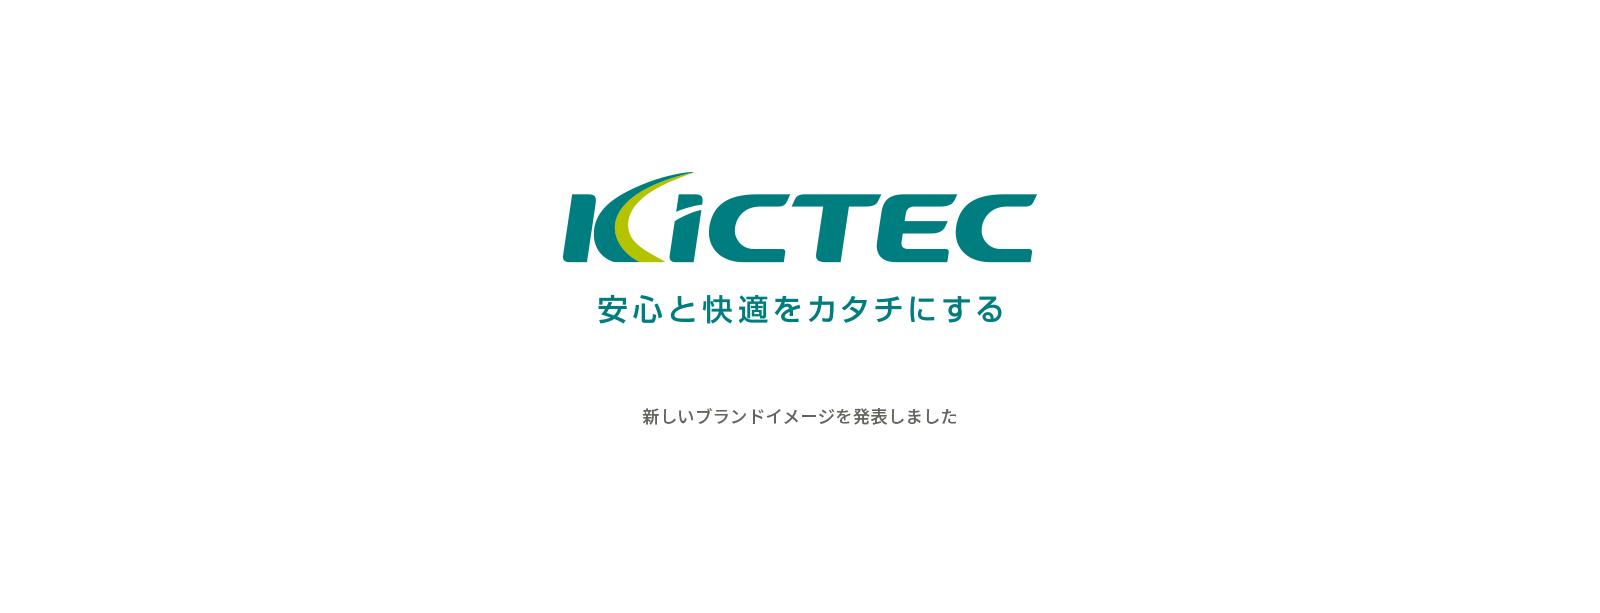 KICTEC   交通インフラから公共空間まで多彩な快適環境保全創りに挑みます